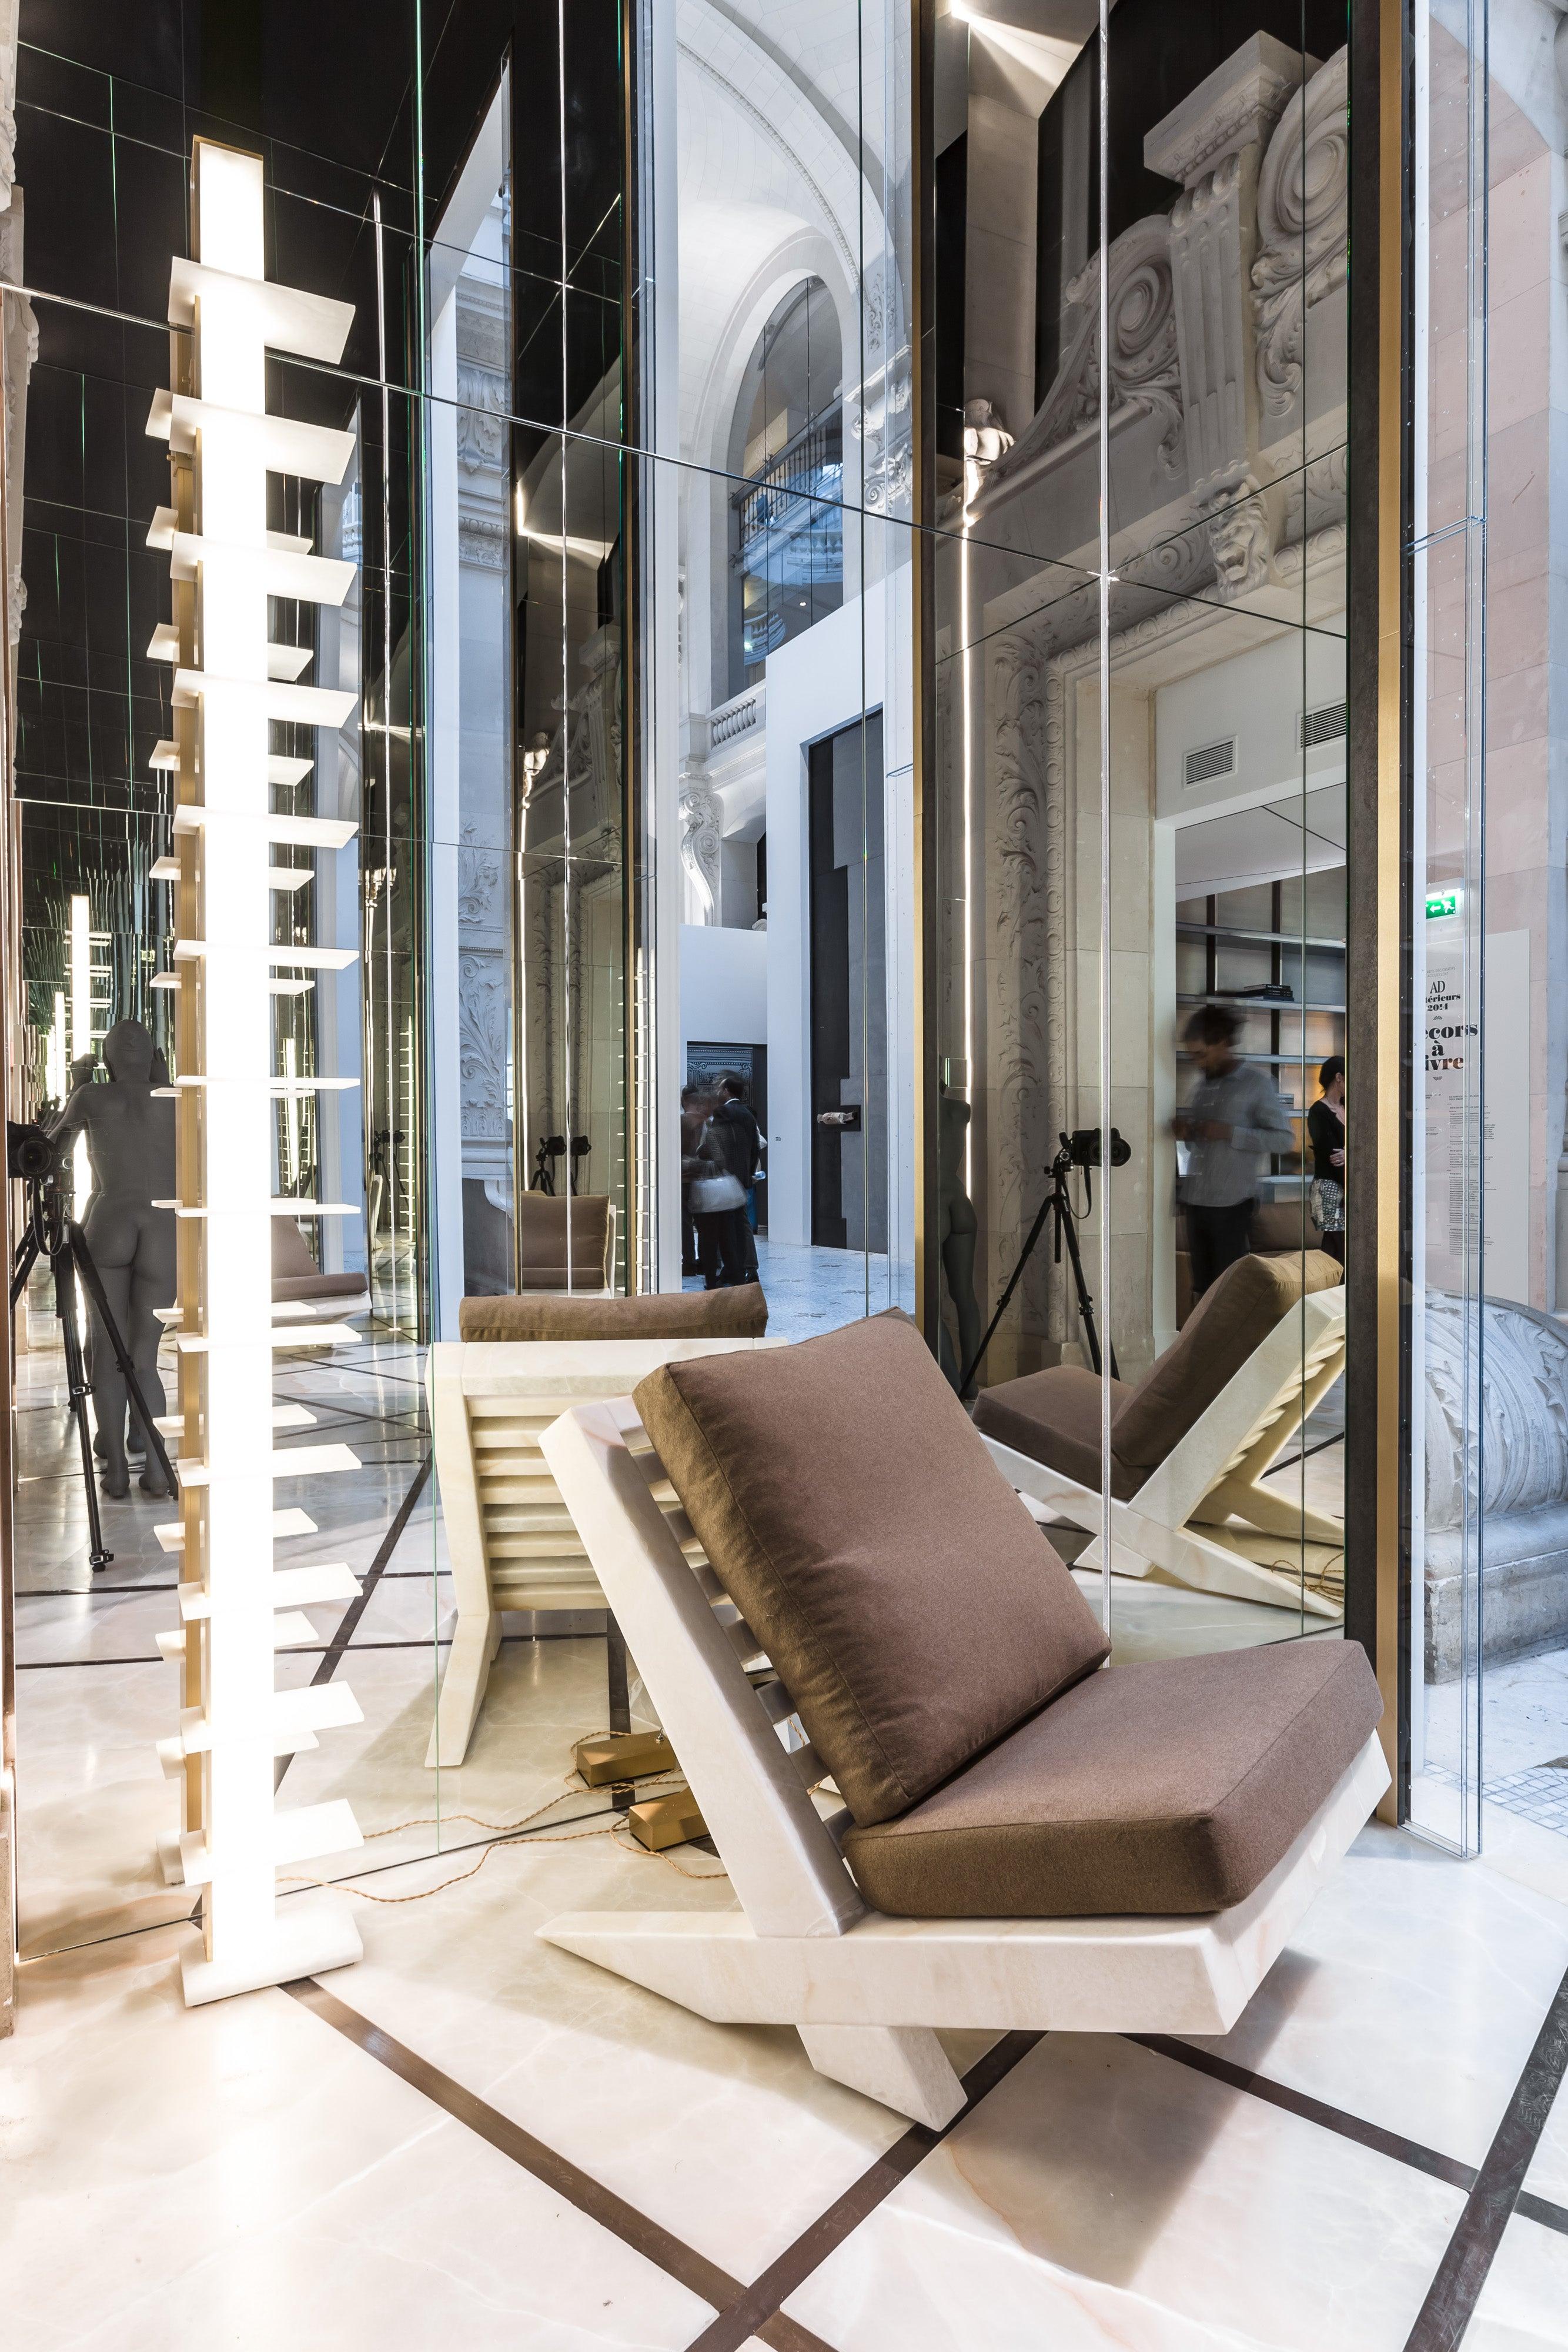 d cors vivre by isabelle stanislas architecture on 1stdibs. Black Bedroom Furniture Sets. Home Design Ideas